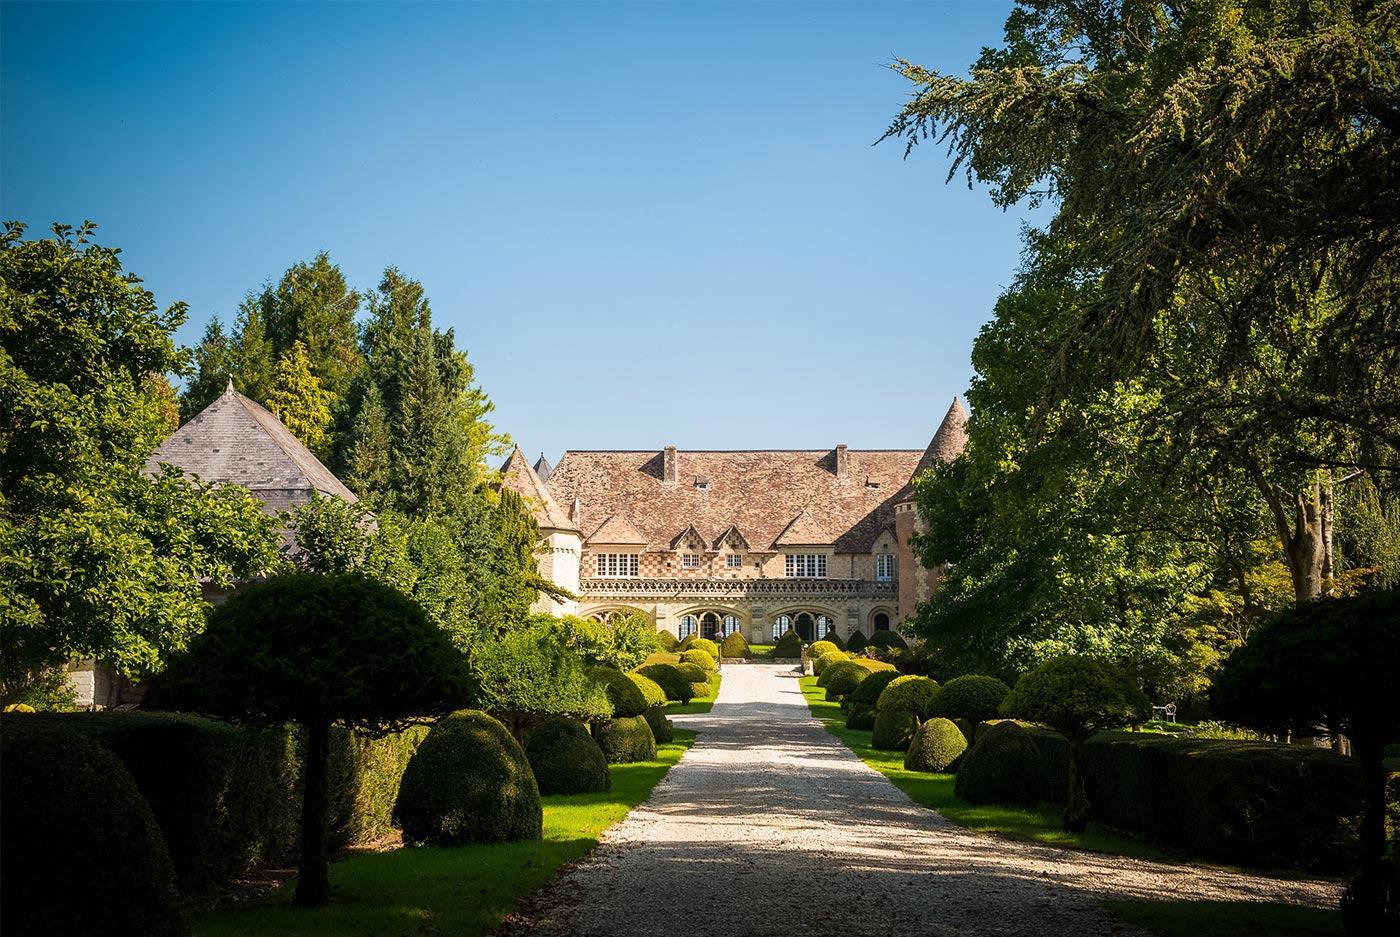 Het kasteel : Chateau de lu0026#39;epine : Kasteel in Picardiu00eb - Acheux-en ...